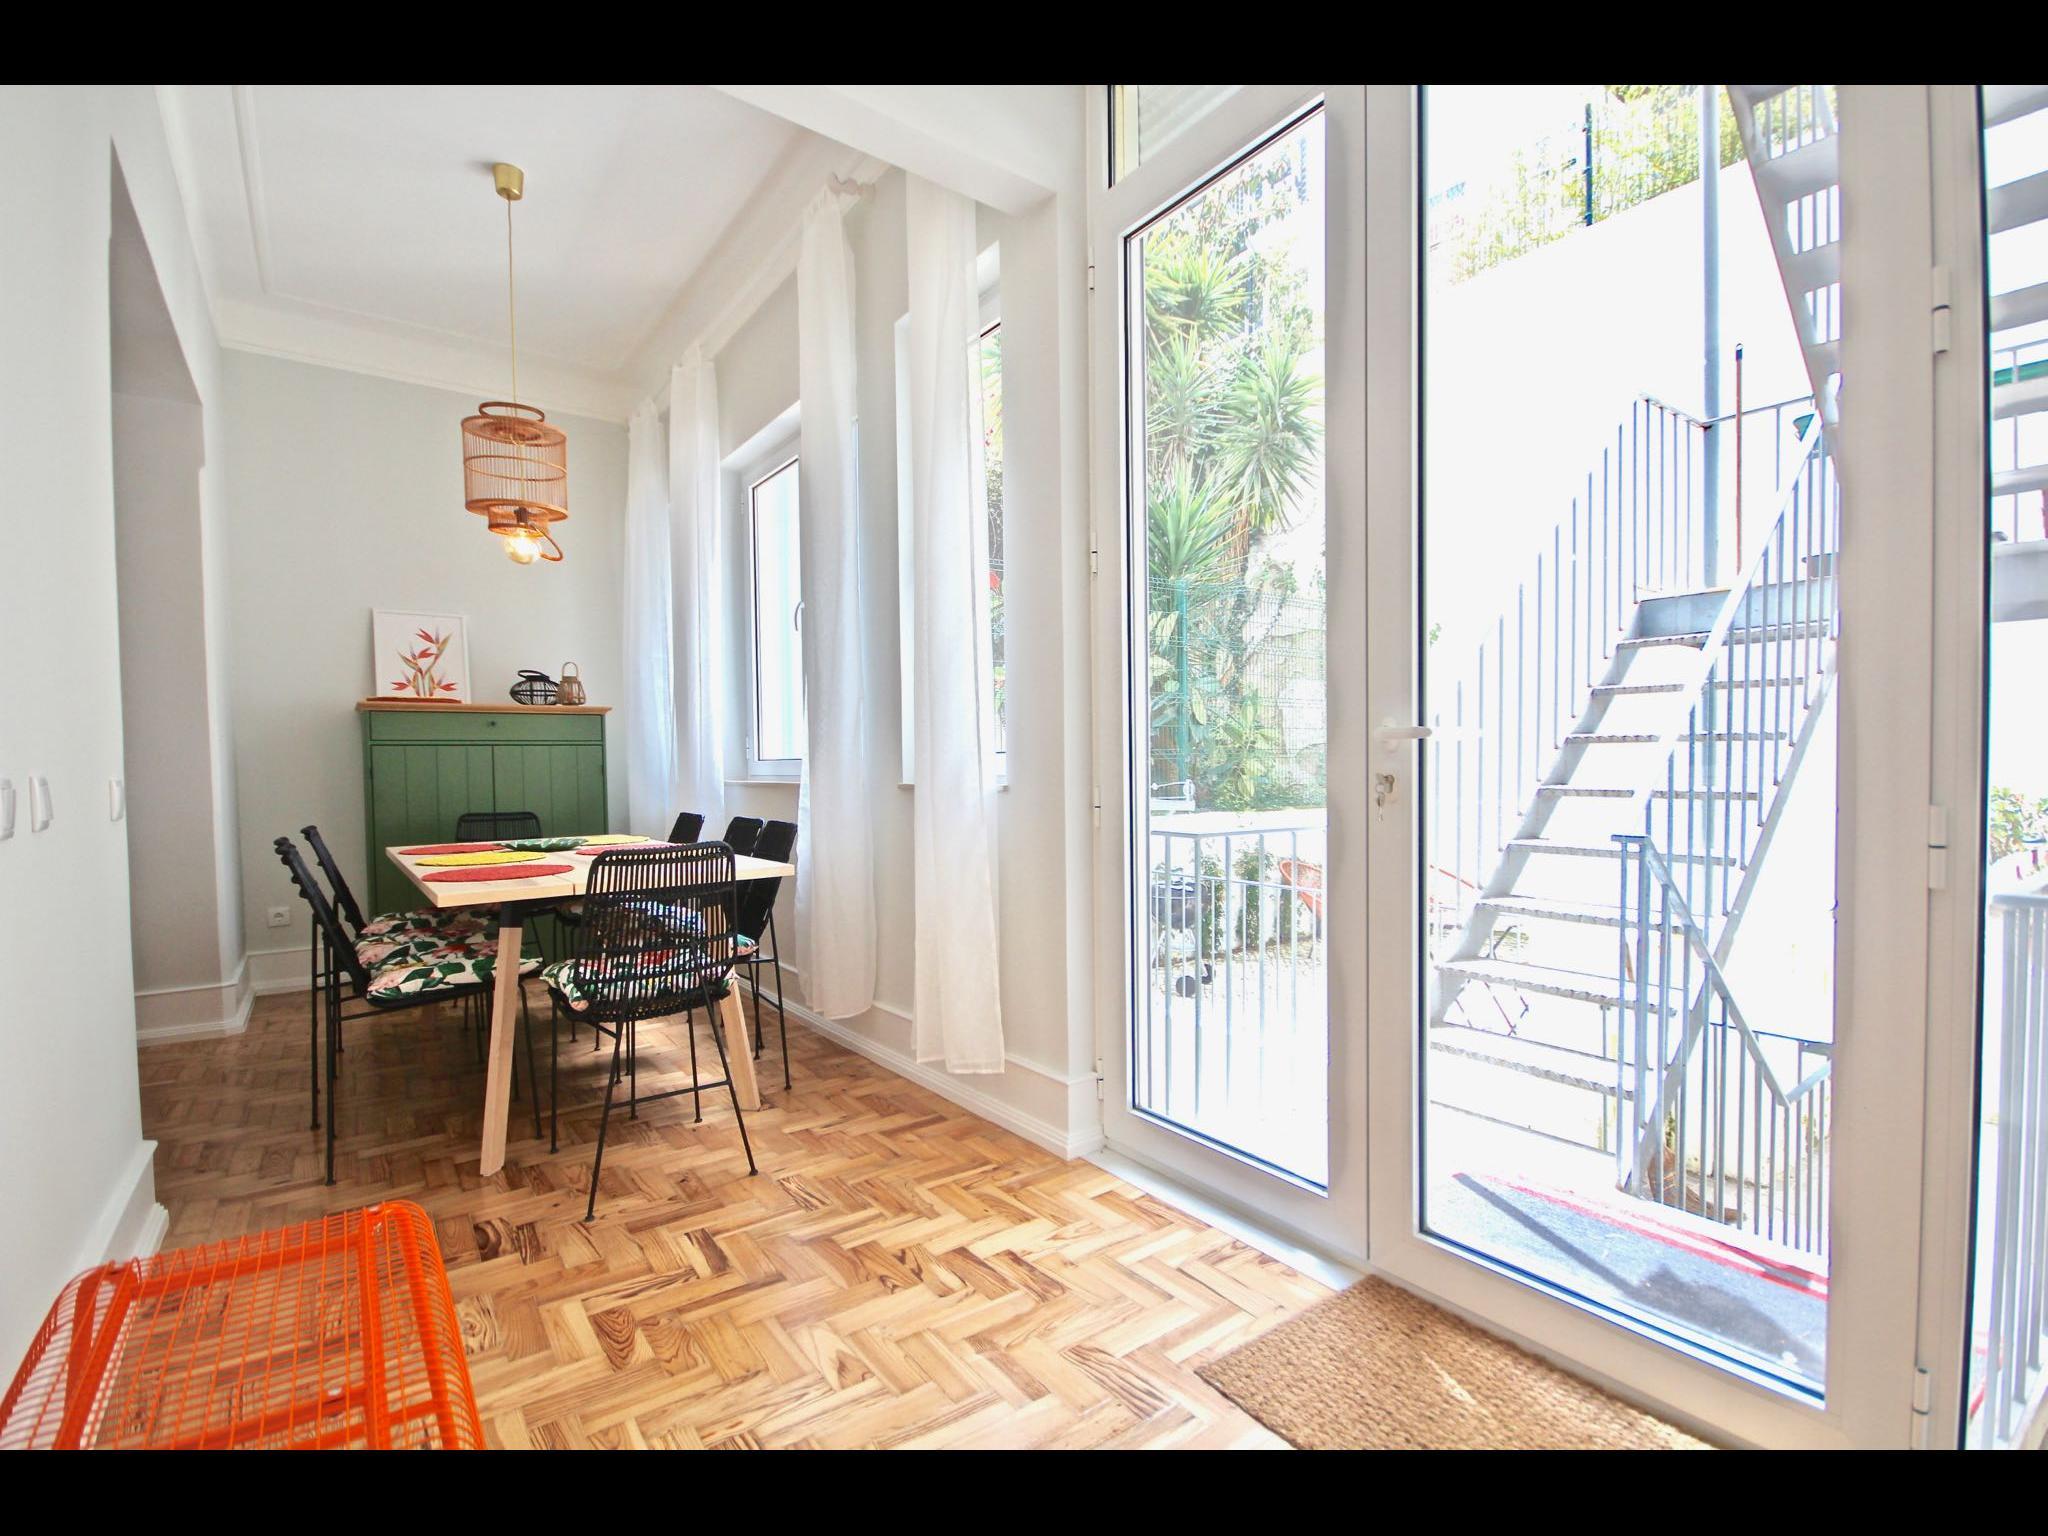 Ortigão - Spacious Apartment with View in Lisbon